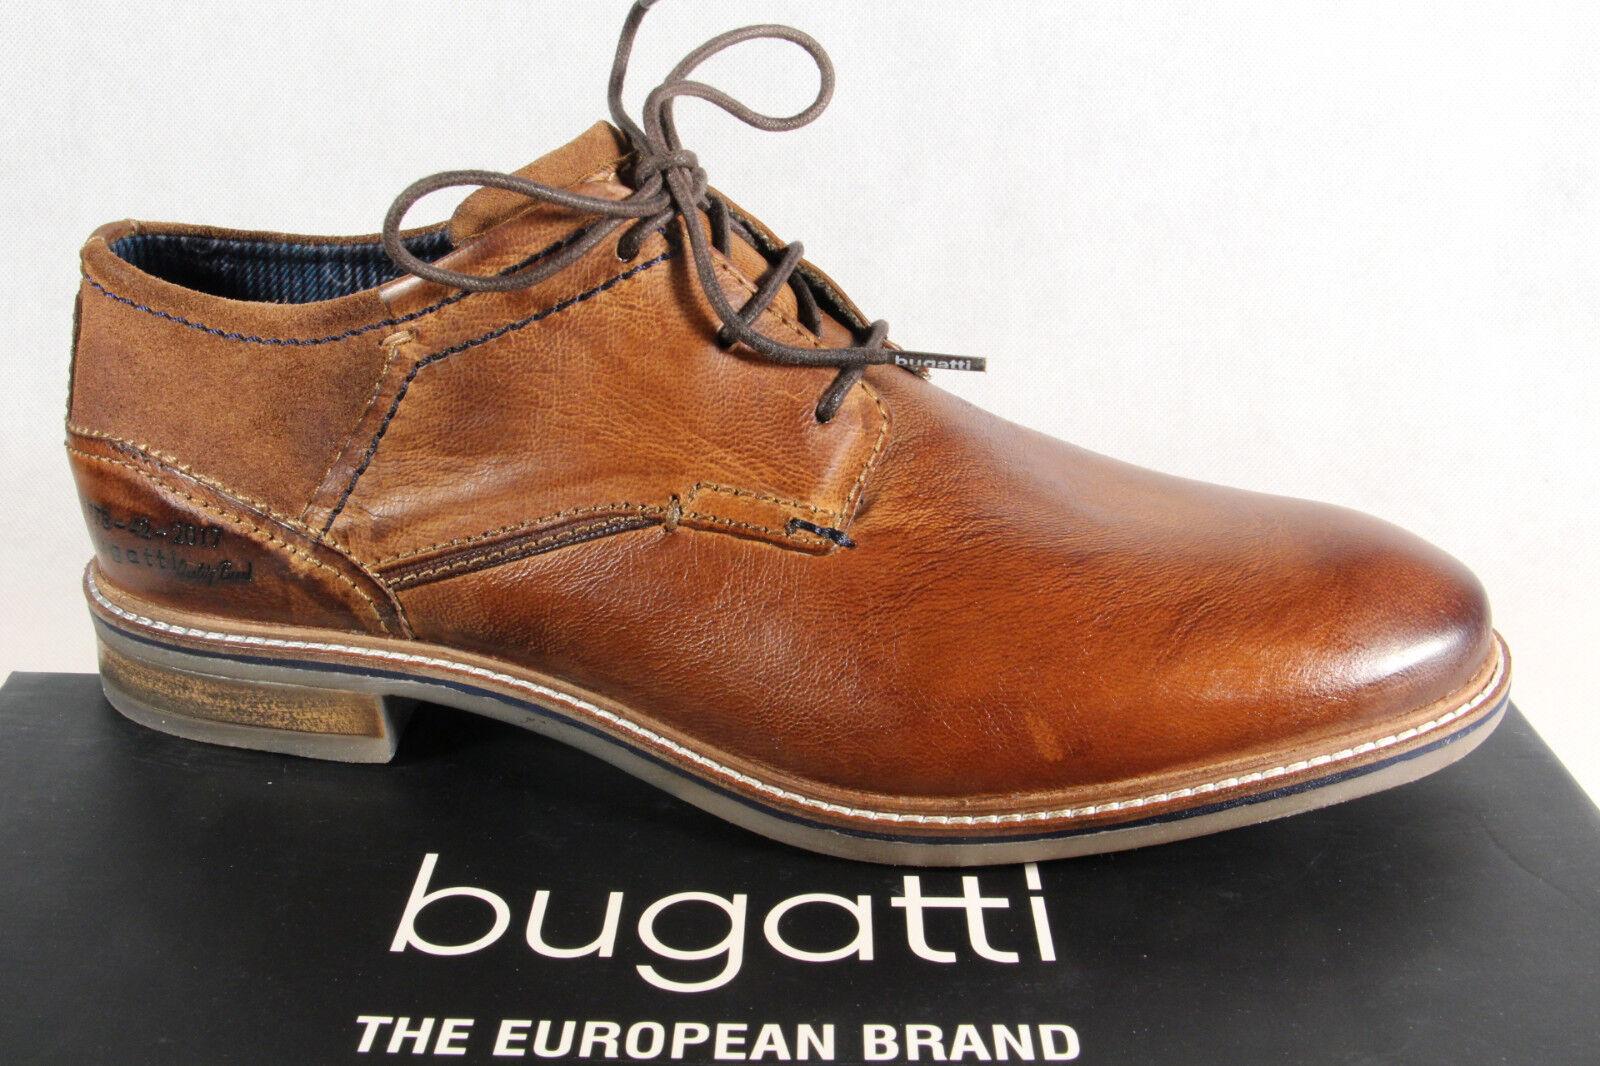 Bugatti braun Herren Schnürschuh Halbschuhe Sneaker braun Bugatti USED LOOK NEU!! 7cbecb